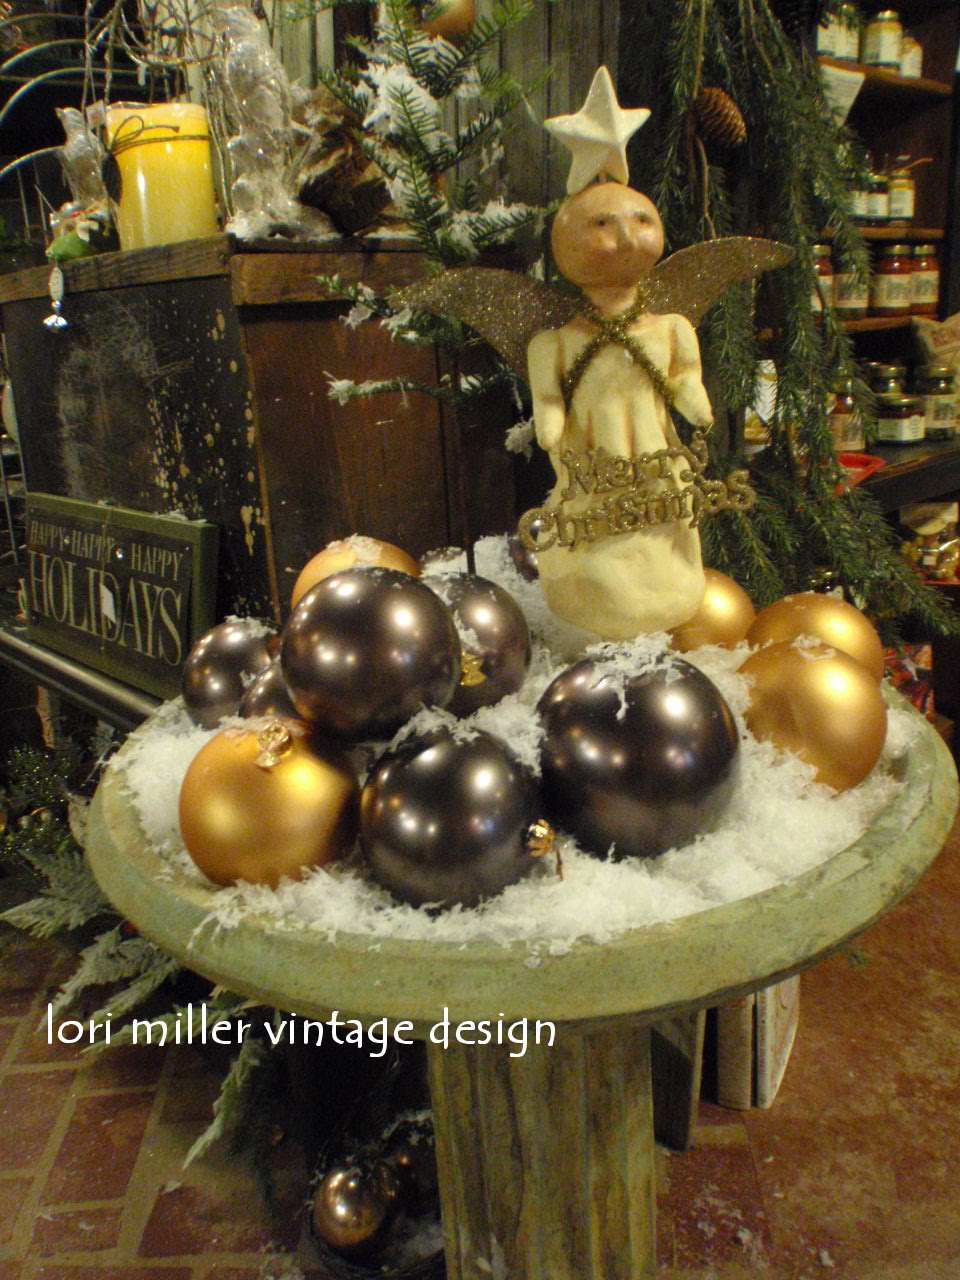 Lori Miller S Round Barn Potting Company Olden Days